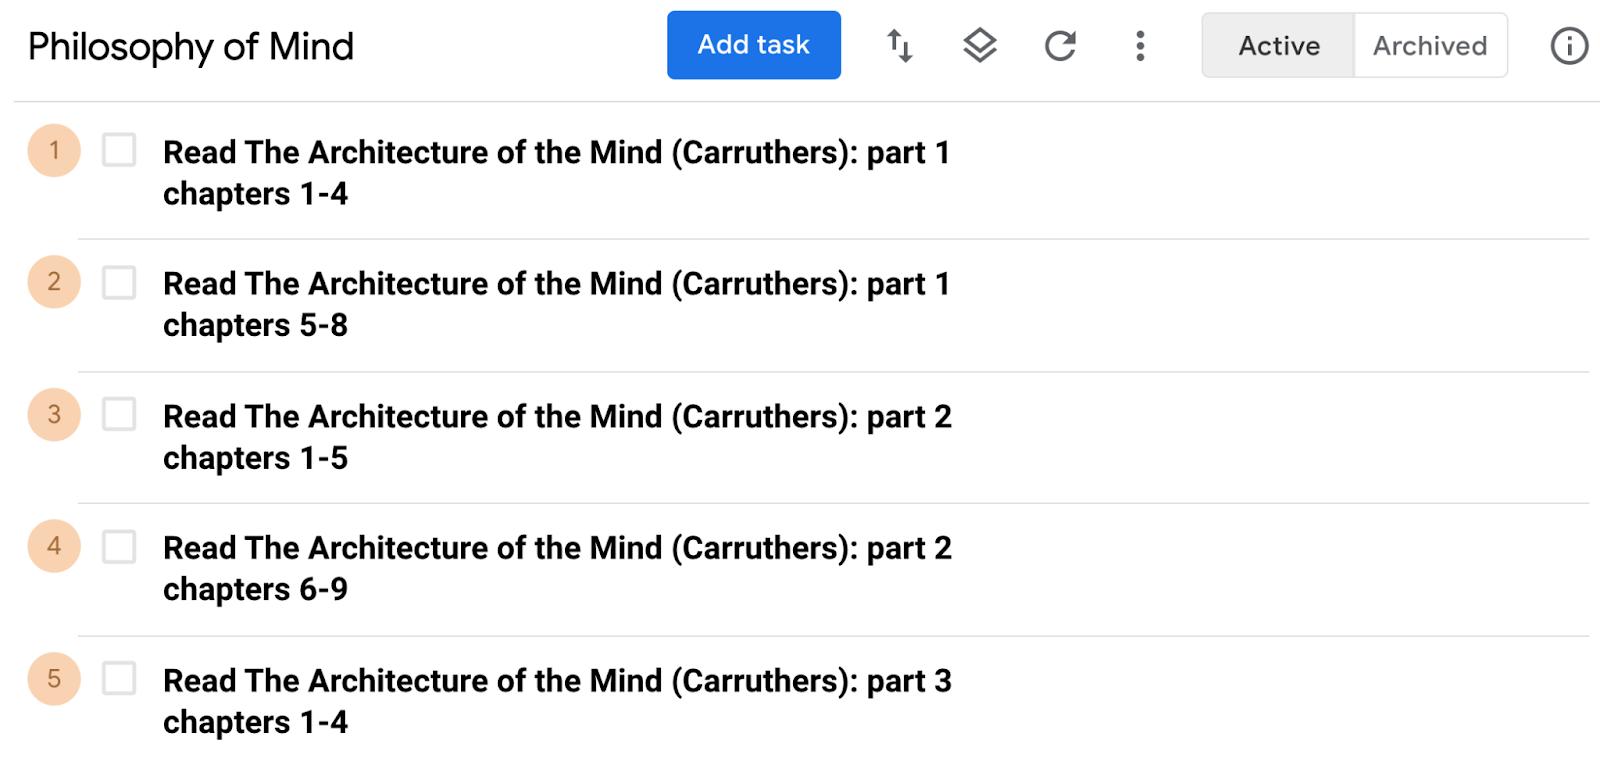 Duplicated tasks after editing copies